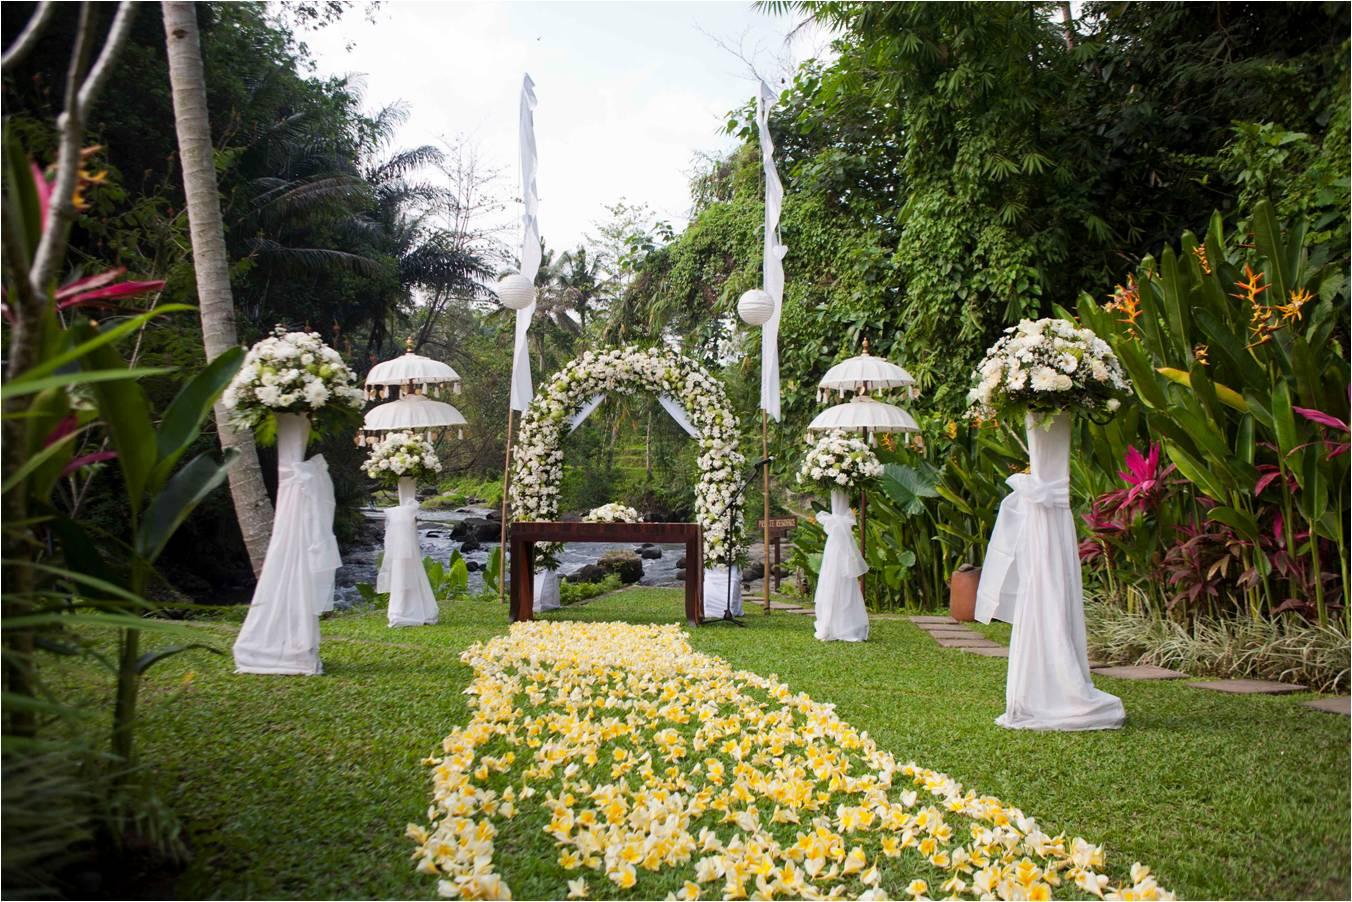 Ubud sayan hotel wedding packages bali wedding blog the samaya ubud sayan wedding packages junglespirit Image collections